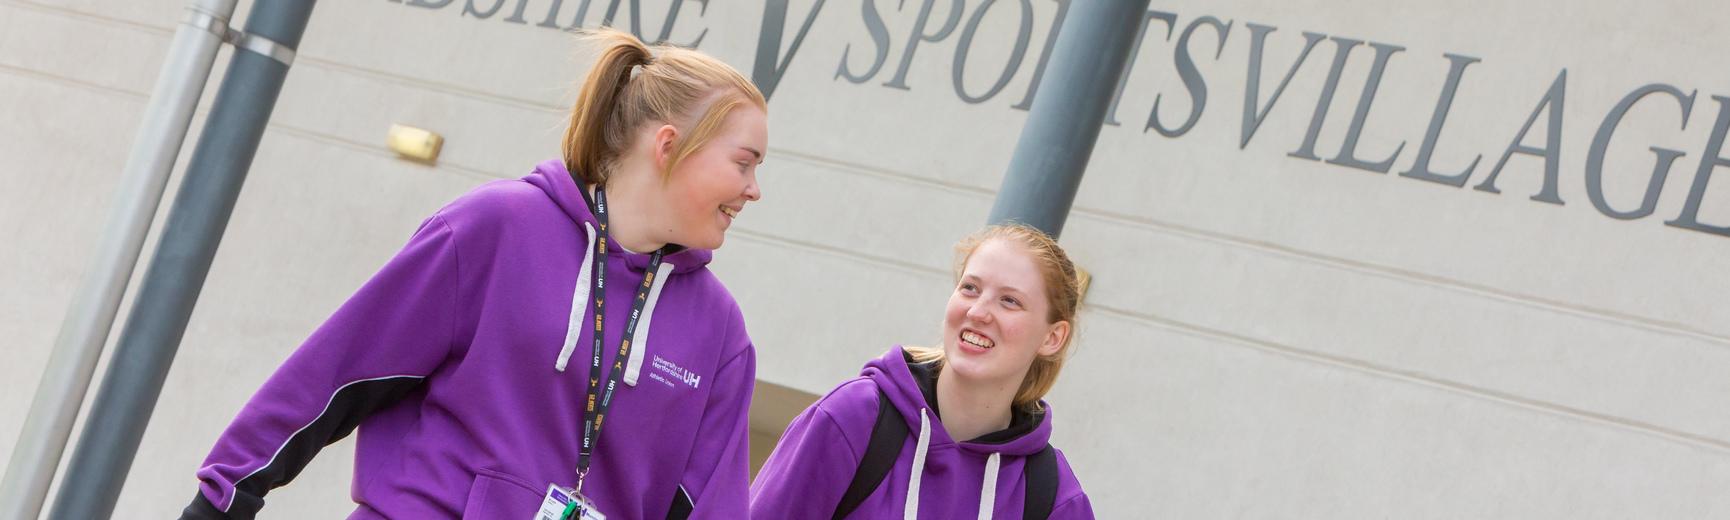 two female sport studies students walking outside the Hertfordshire Sport Village